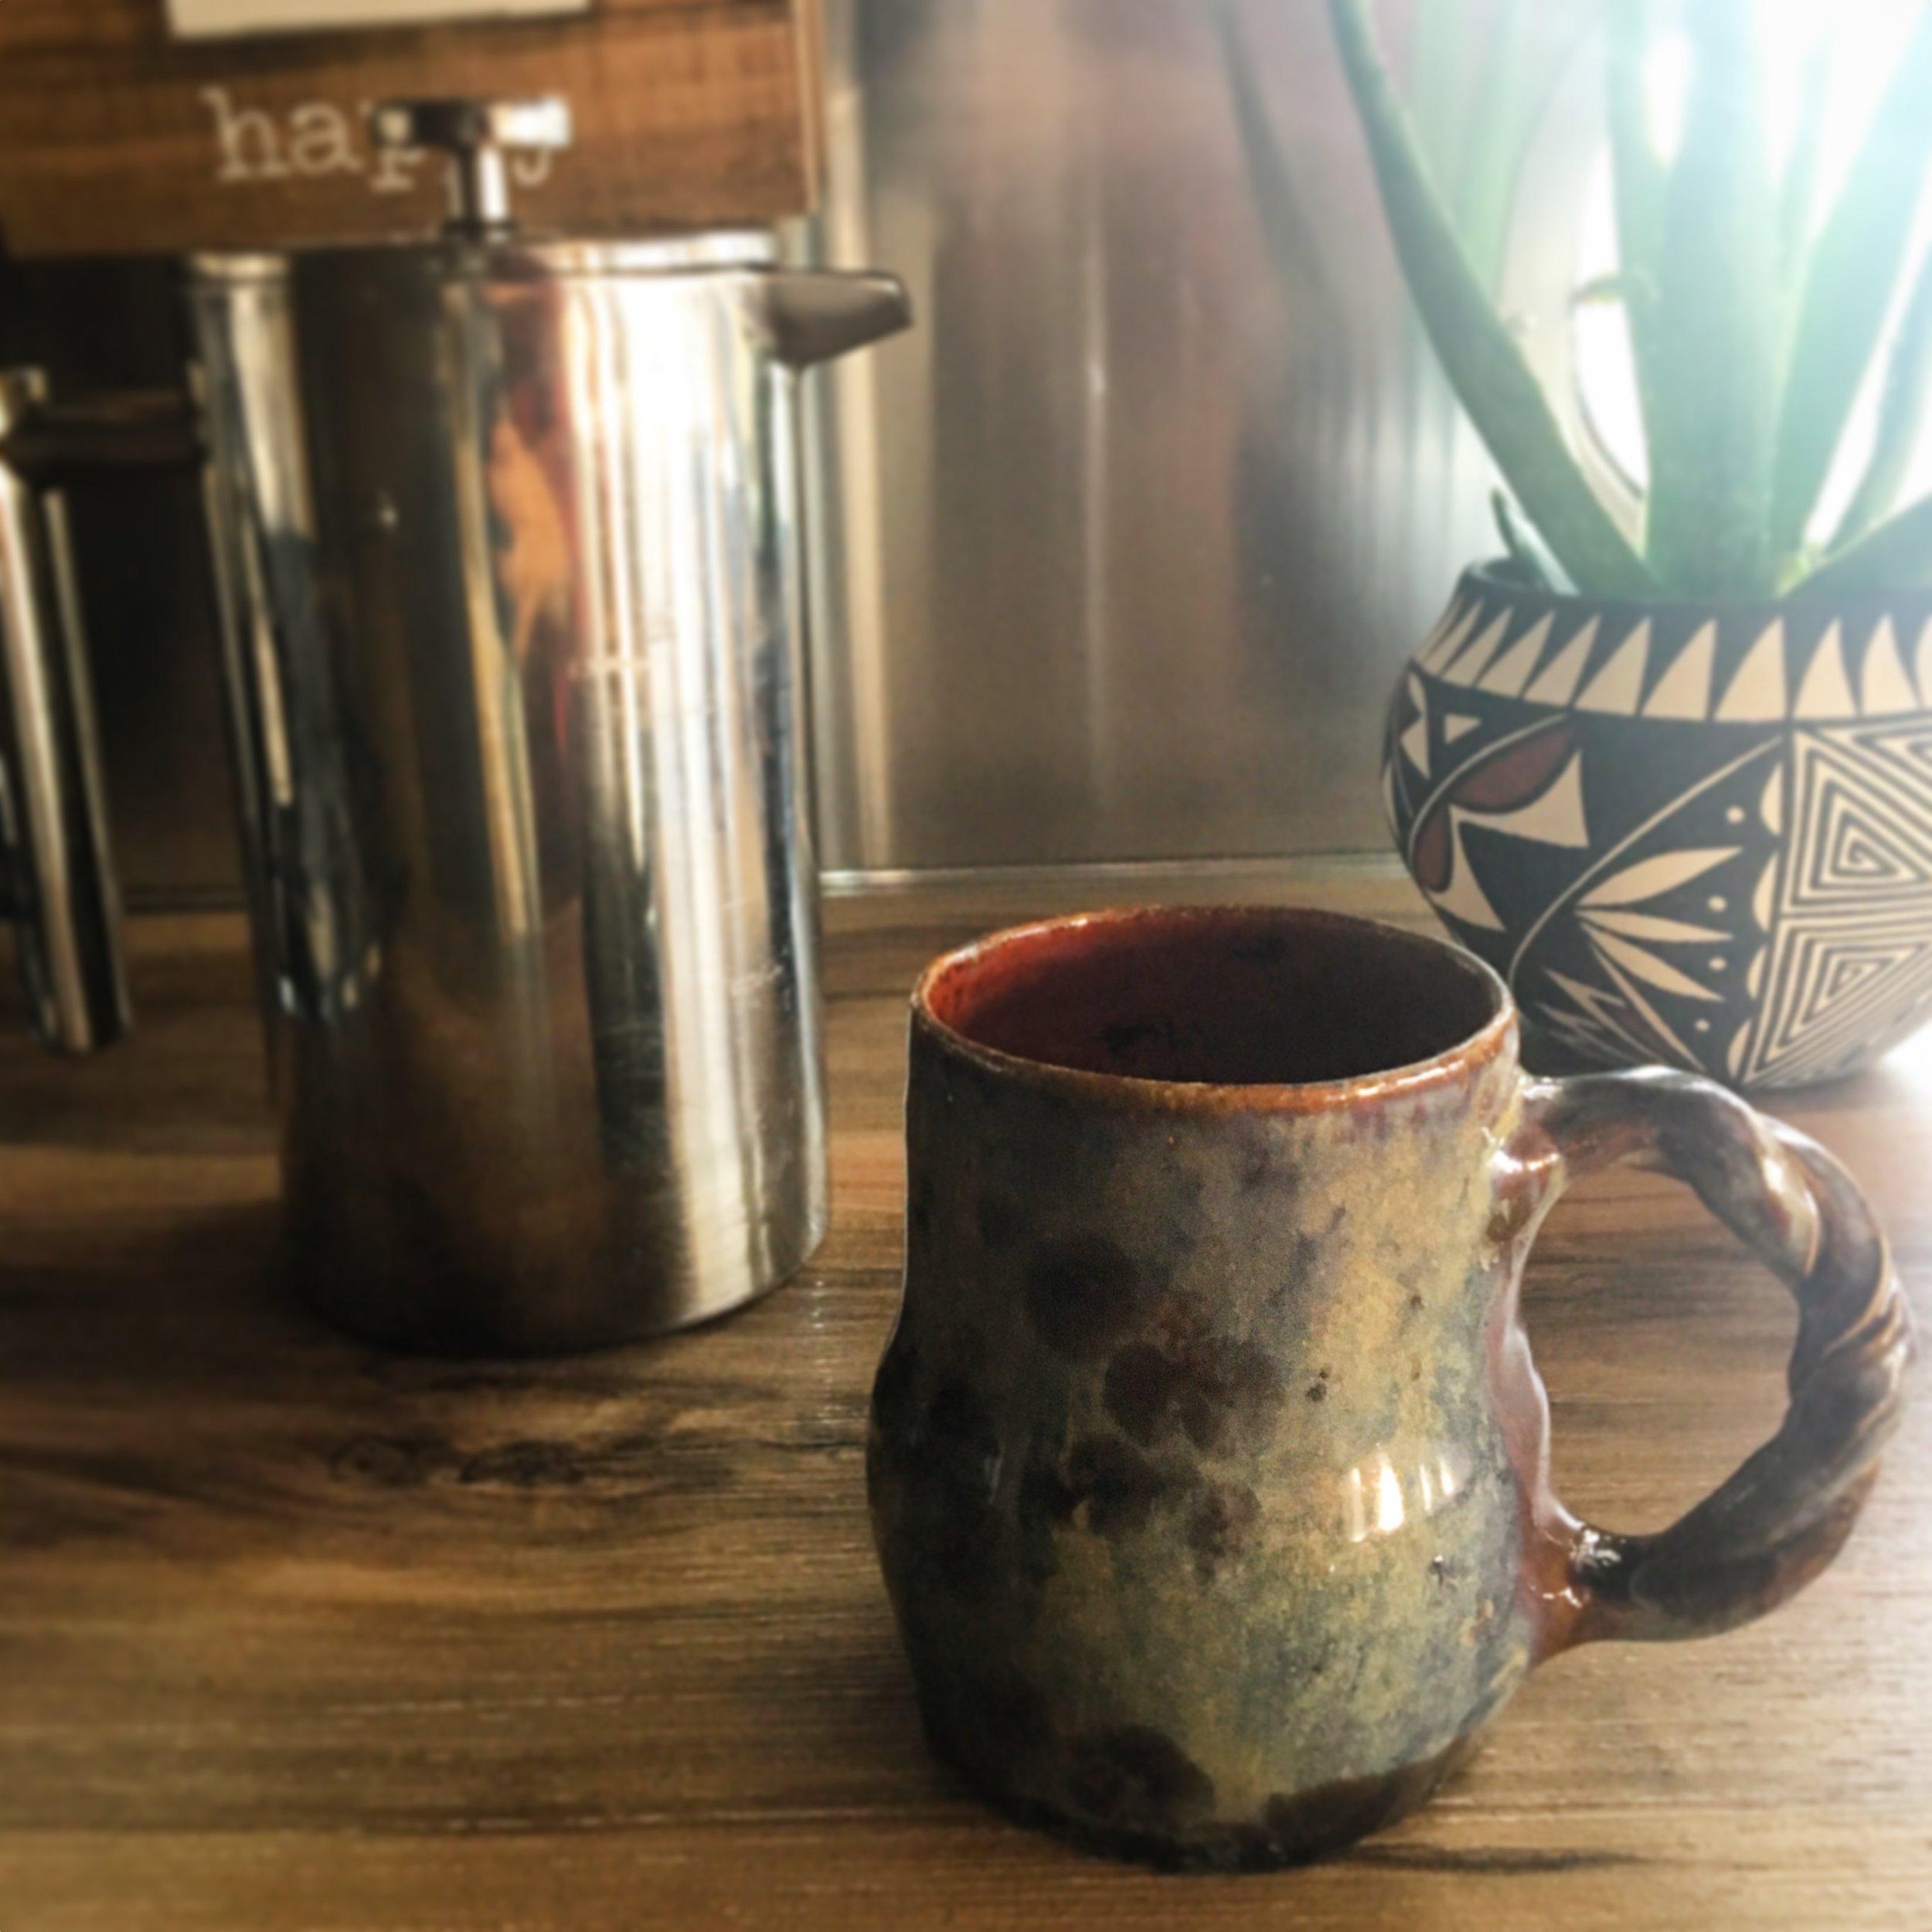 Love my new mug and pottery!